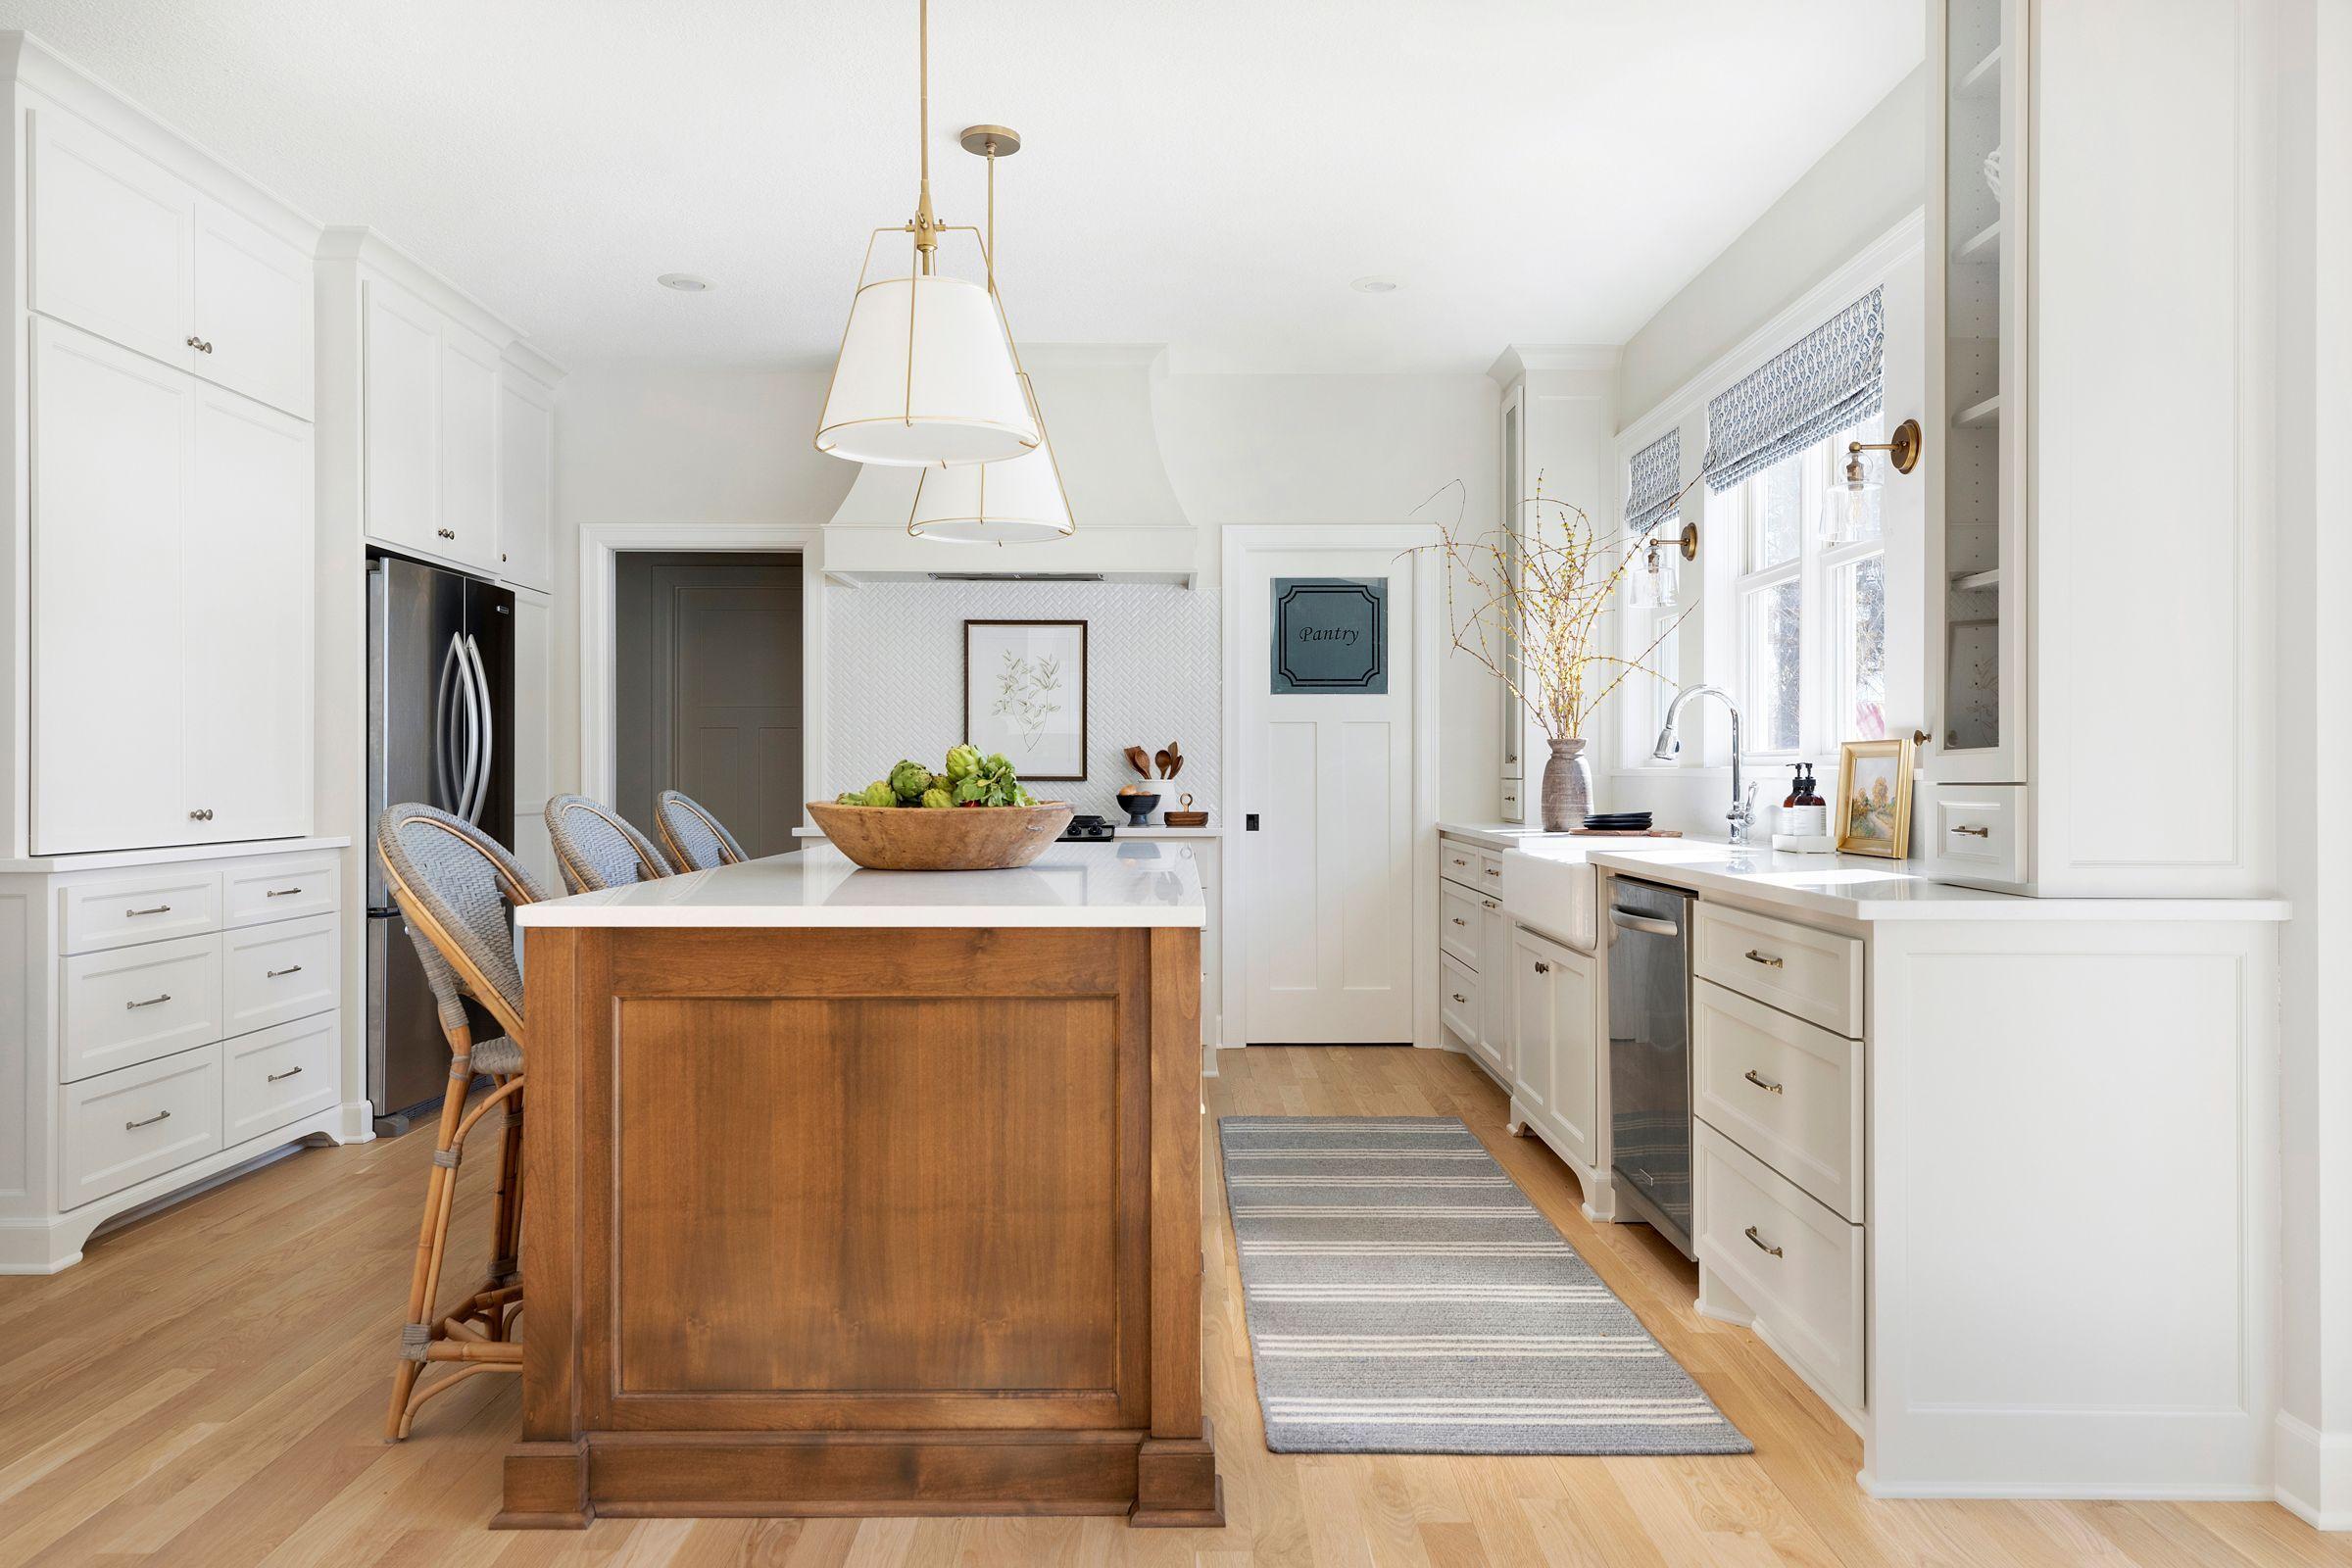 Melody Lake Renovation Reveal Bria Hammel Interiors in